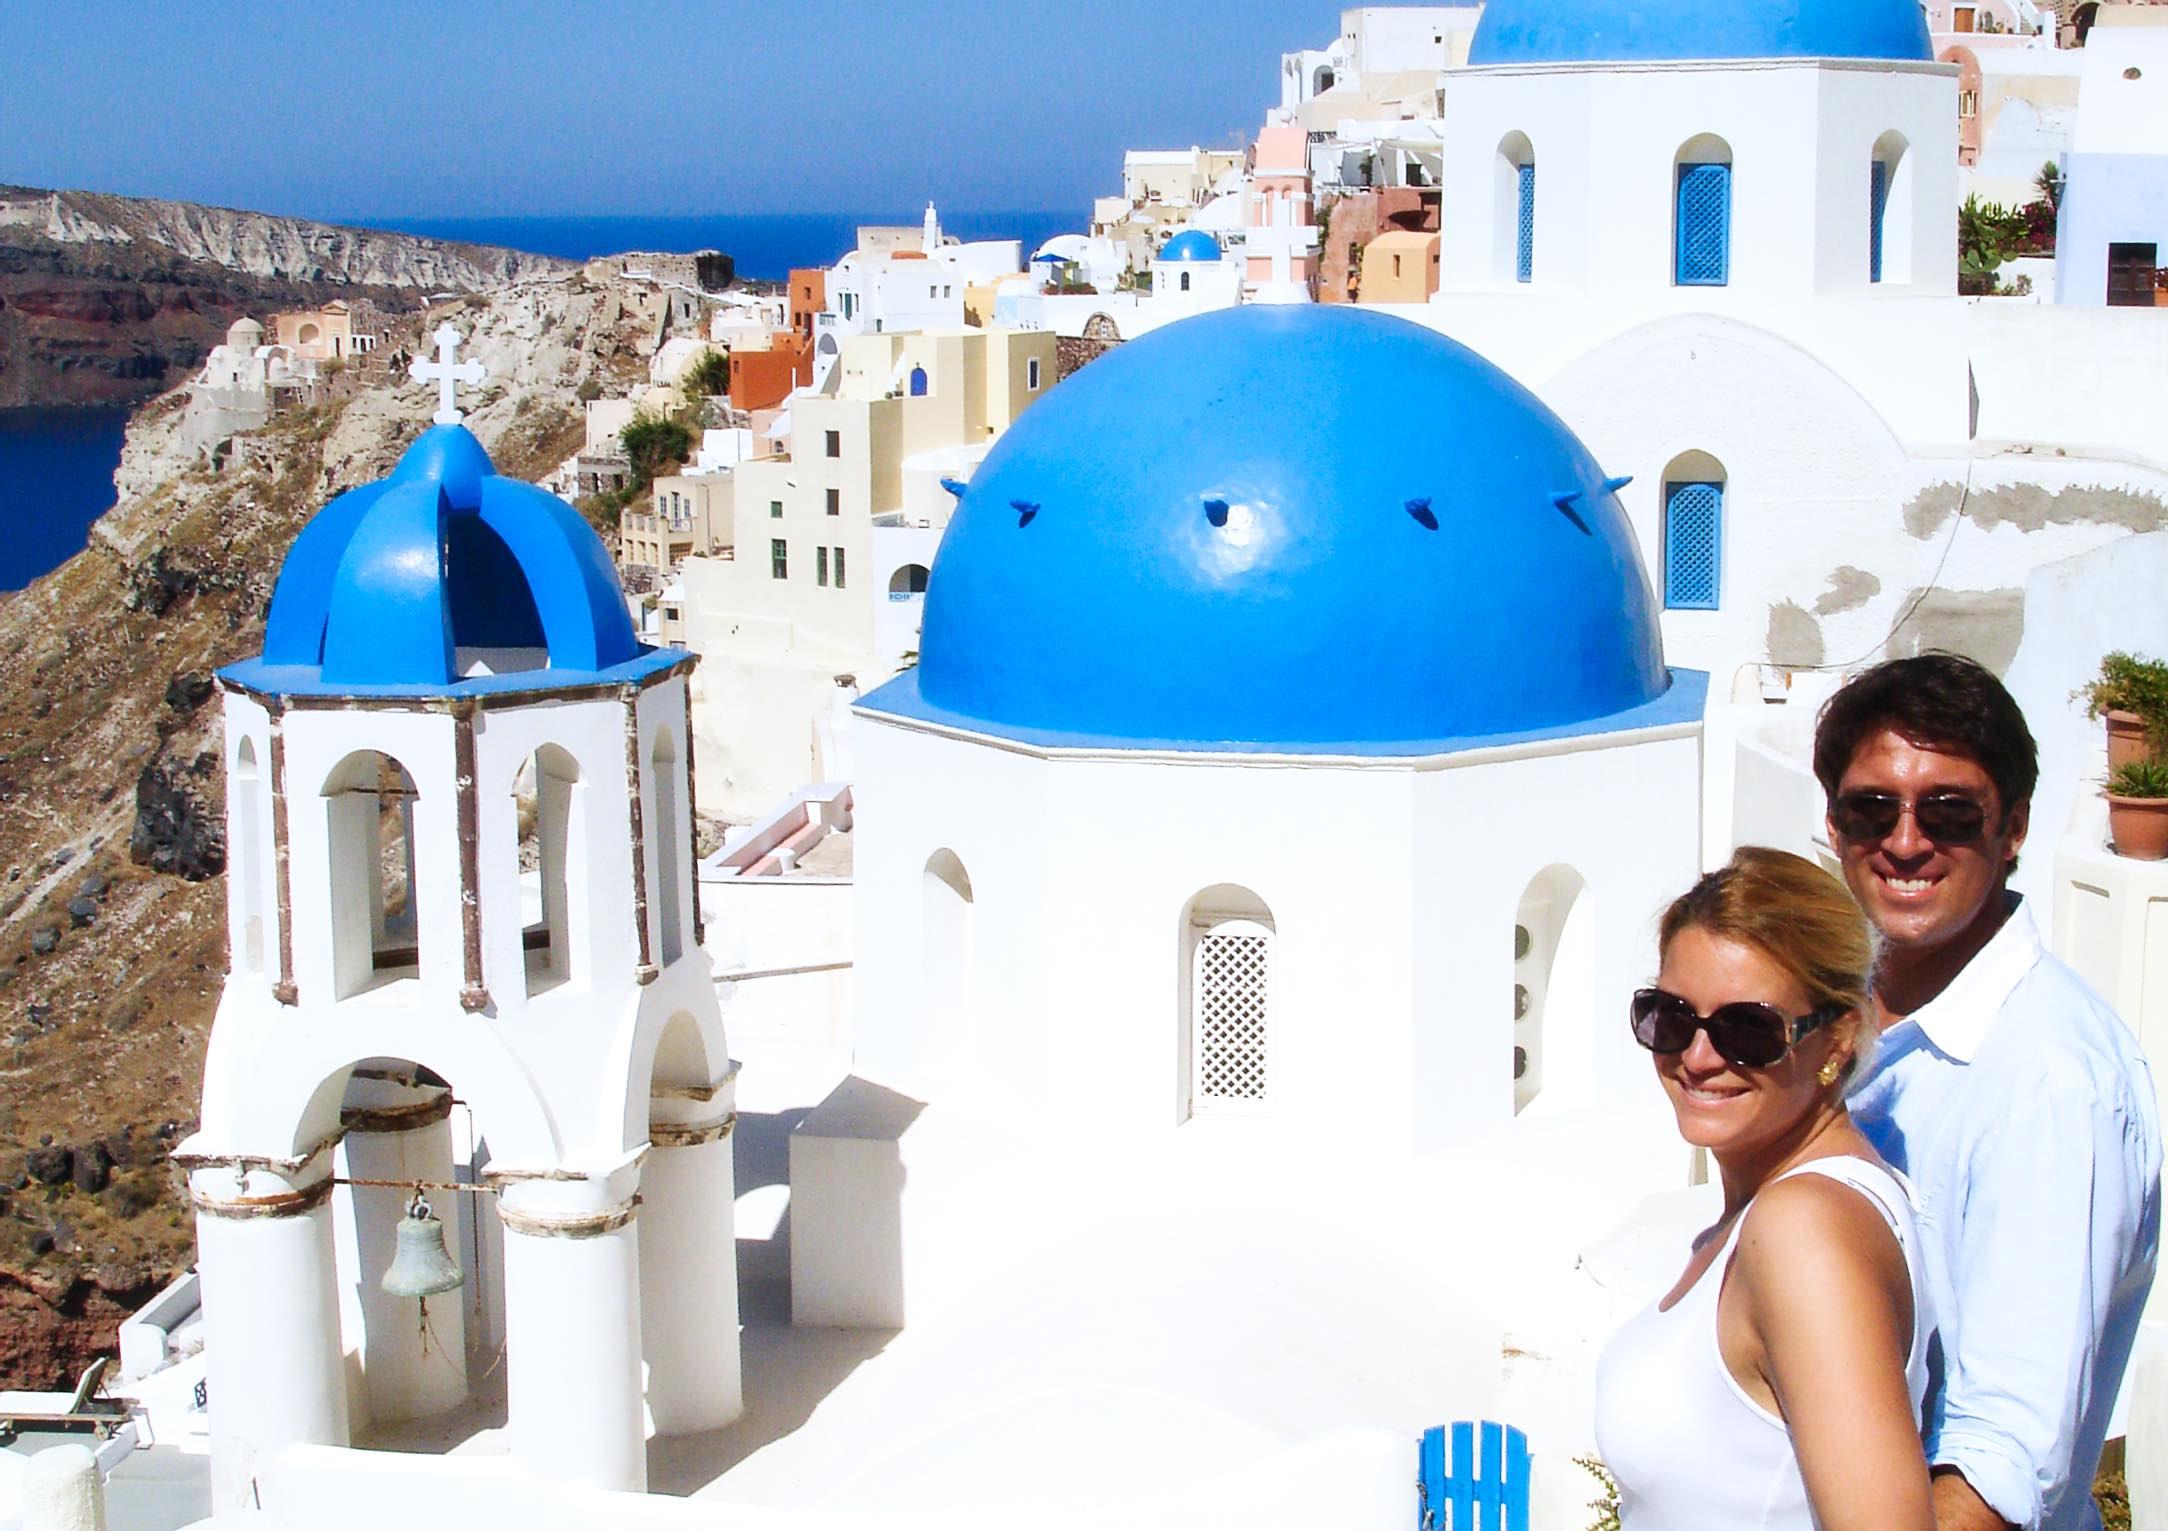 Grecia - Santorini Oia 21